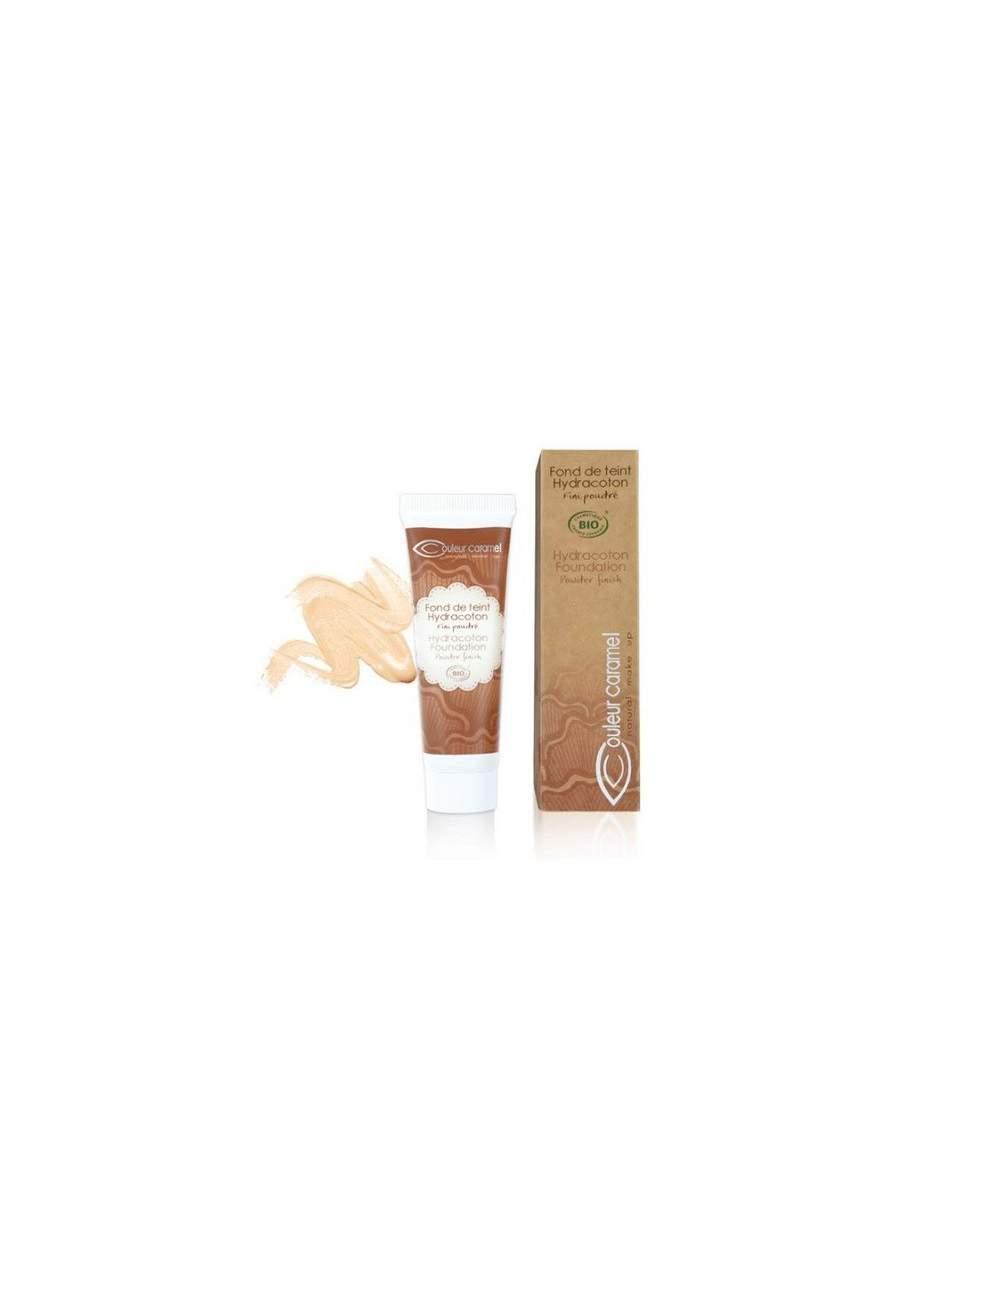 Base de Maquillaje Fluida Bio Hydracoton 11 Marfil. Couleur Caramel